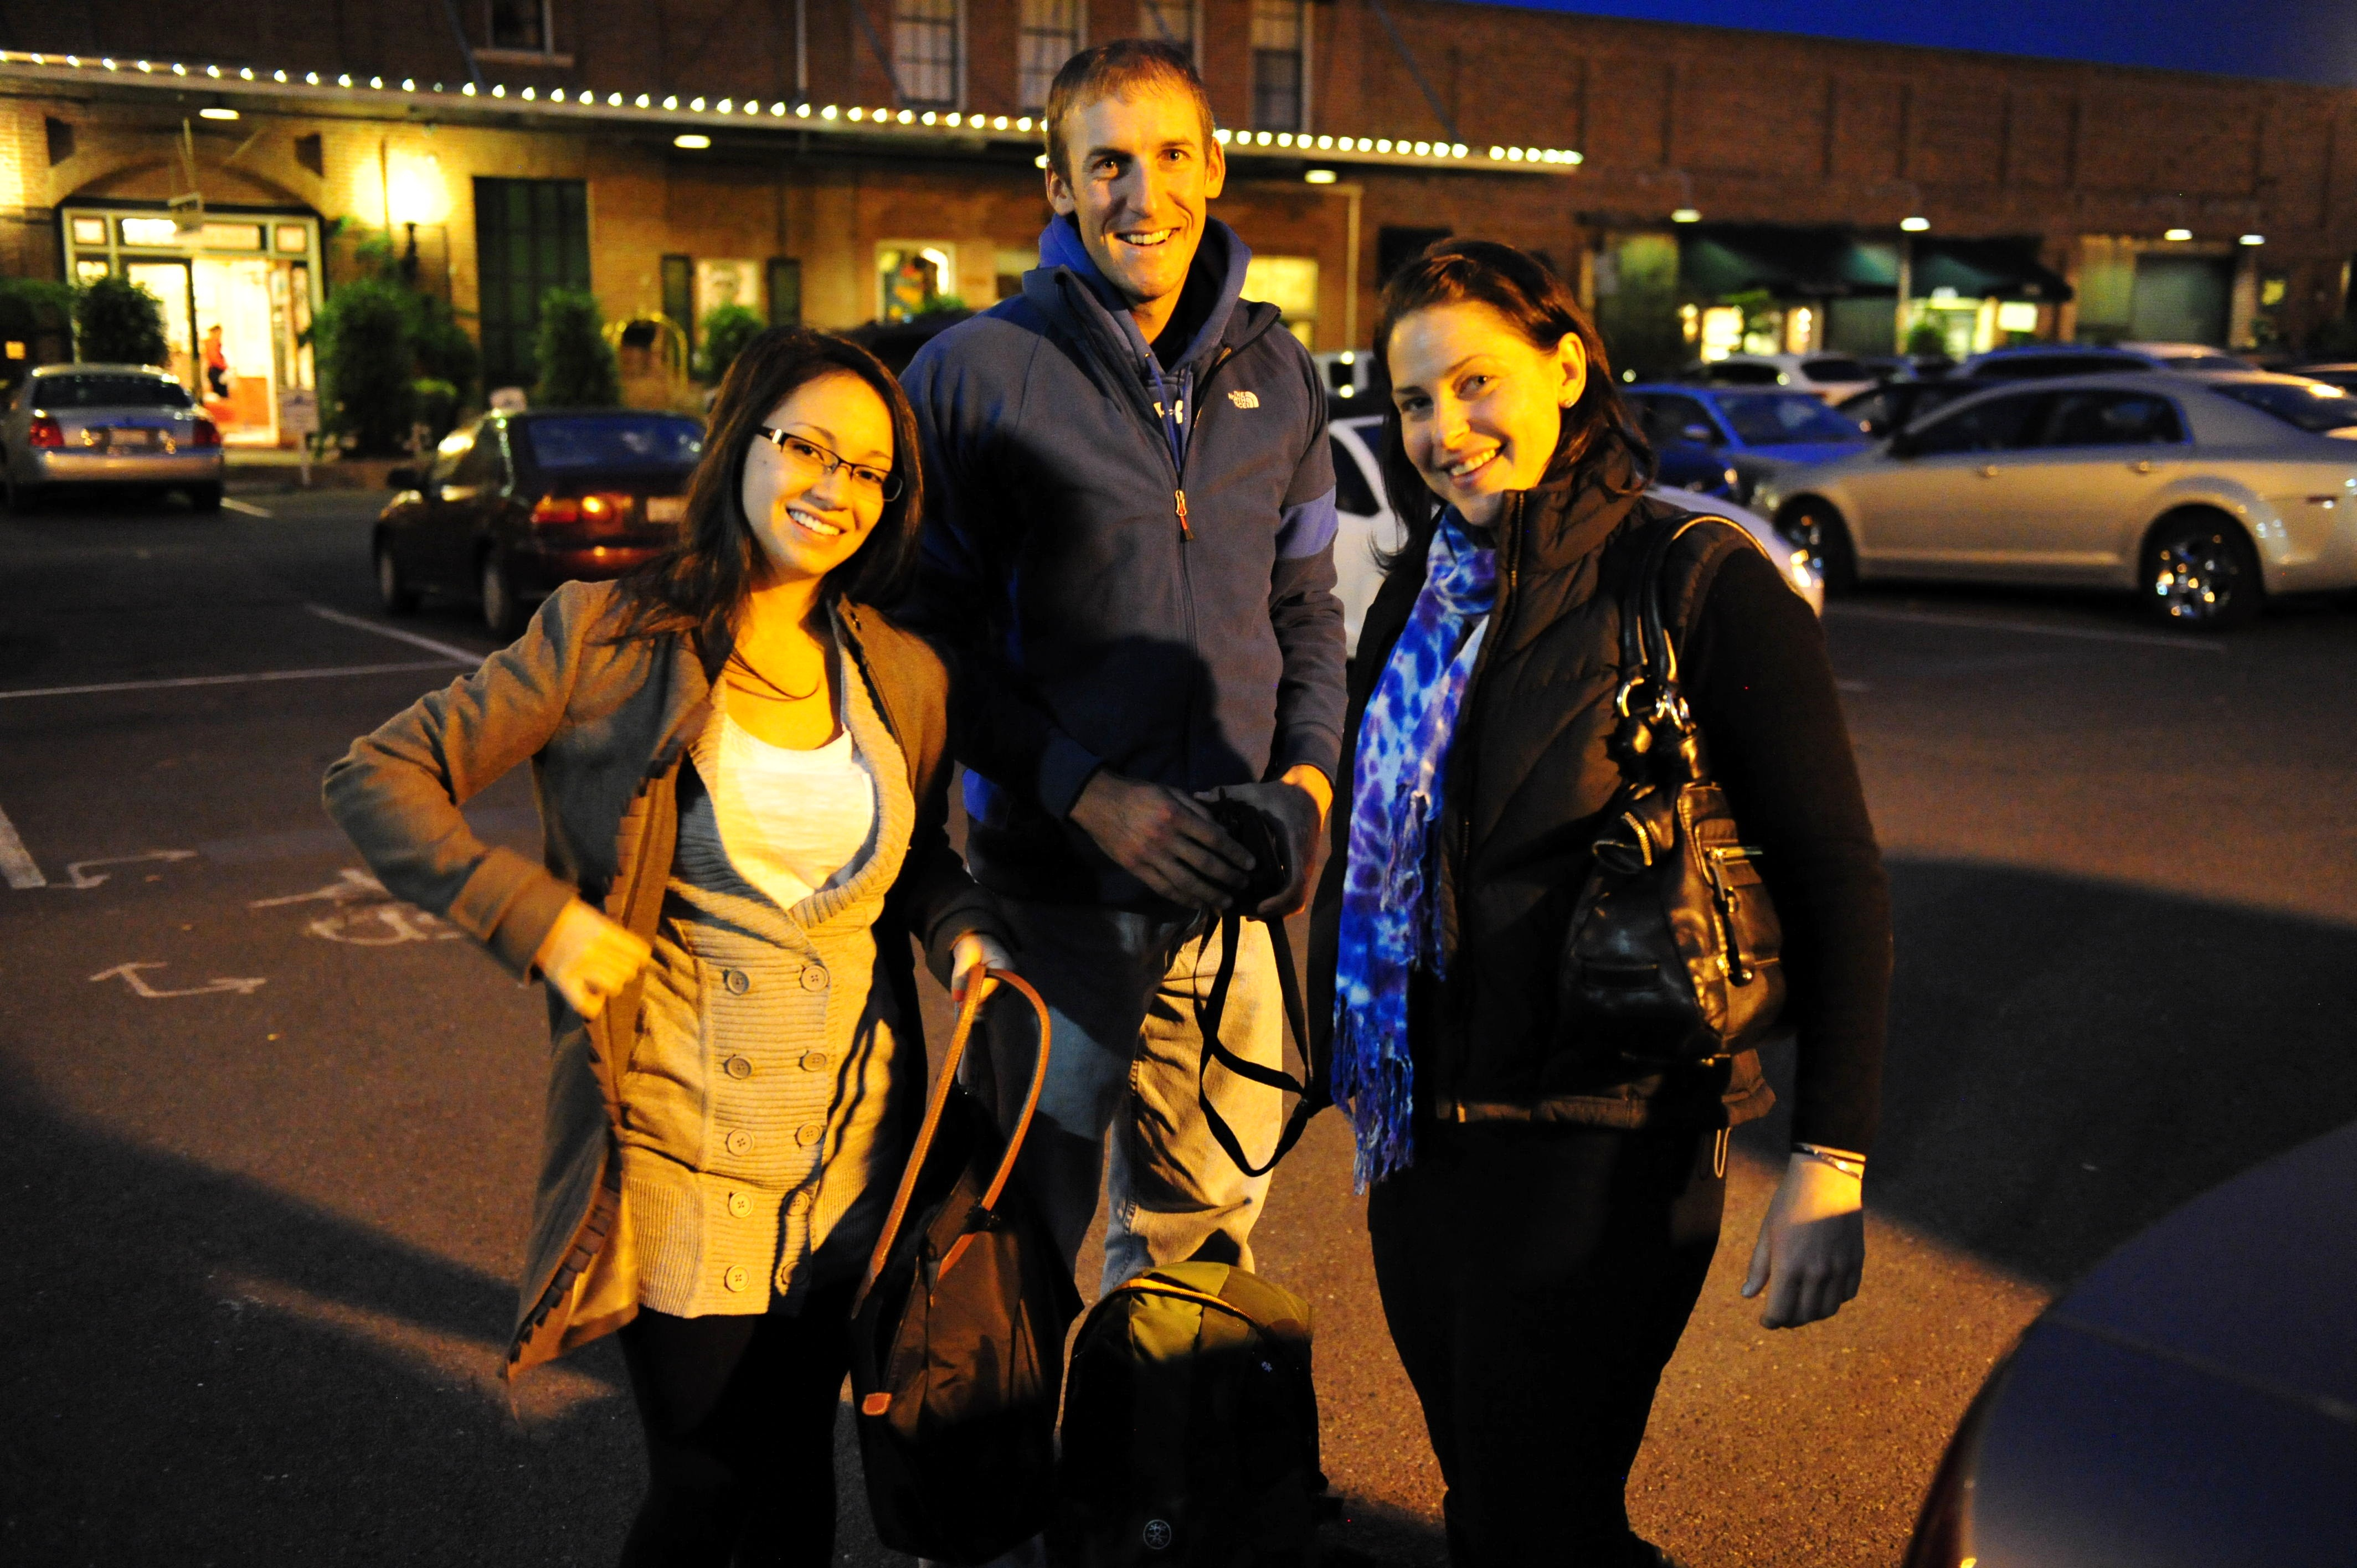 Erica Johnson, Nick Momrik, Rose Goldman